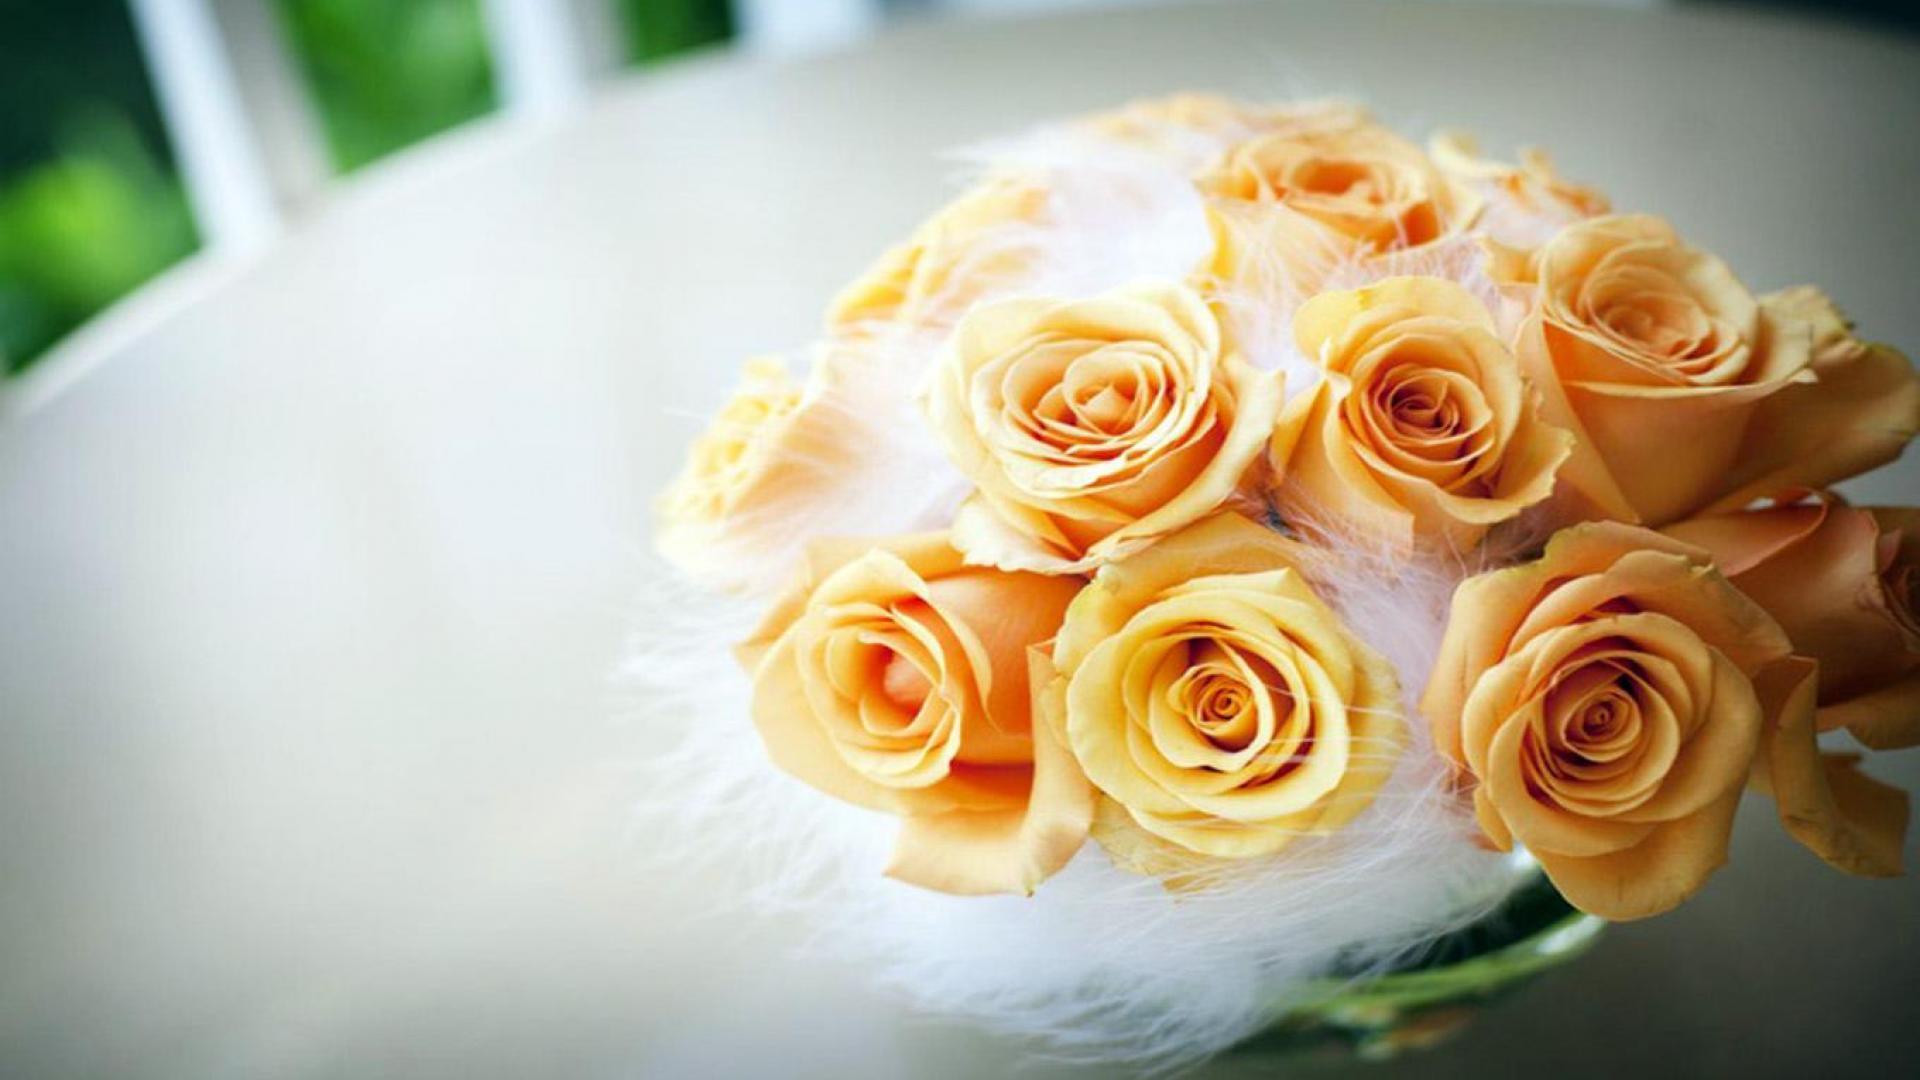 Beautiful-Yellow-Rose-HD-FX-1920%C3%971080-Yellow-Rose-Image-Wallpape-wallpaper-wpc5802696